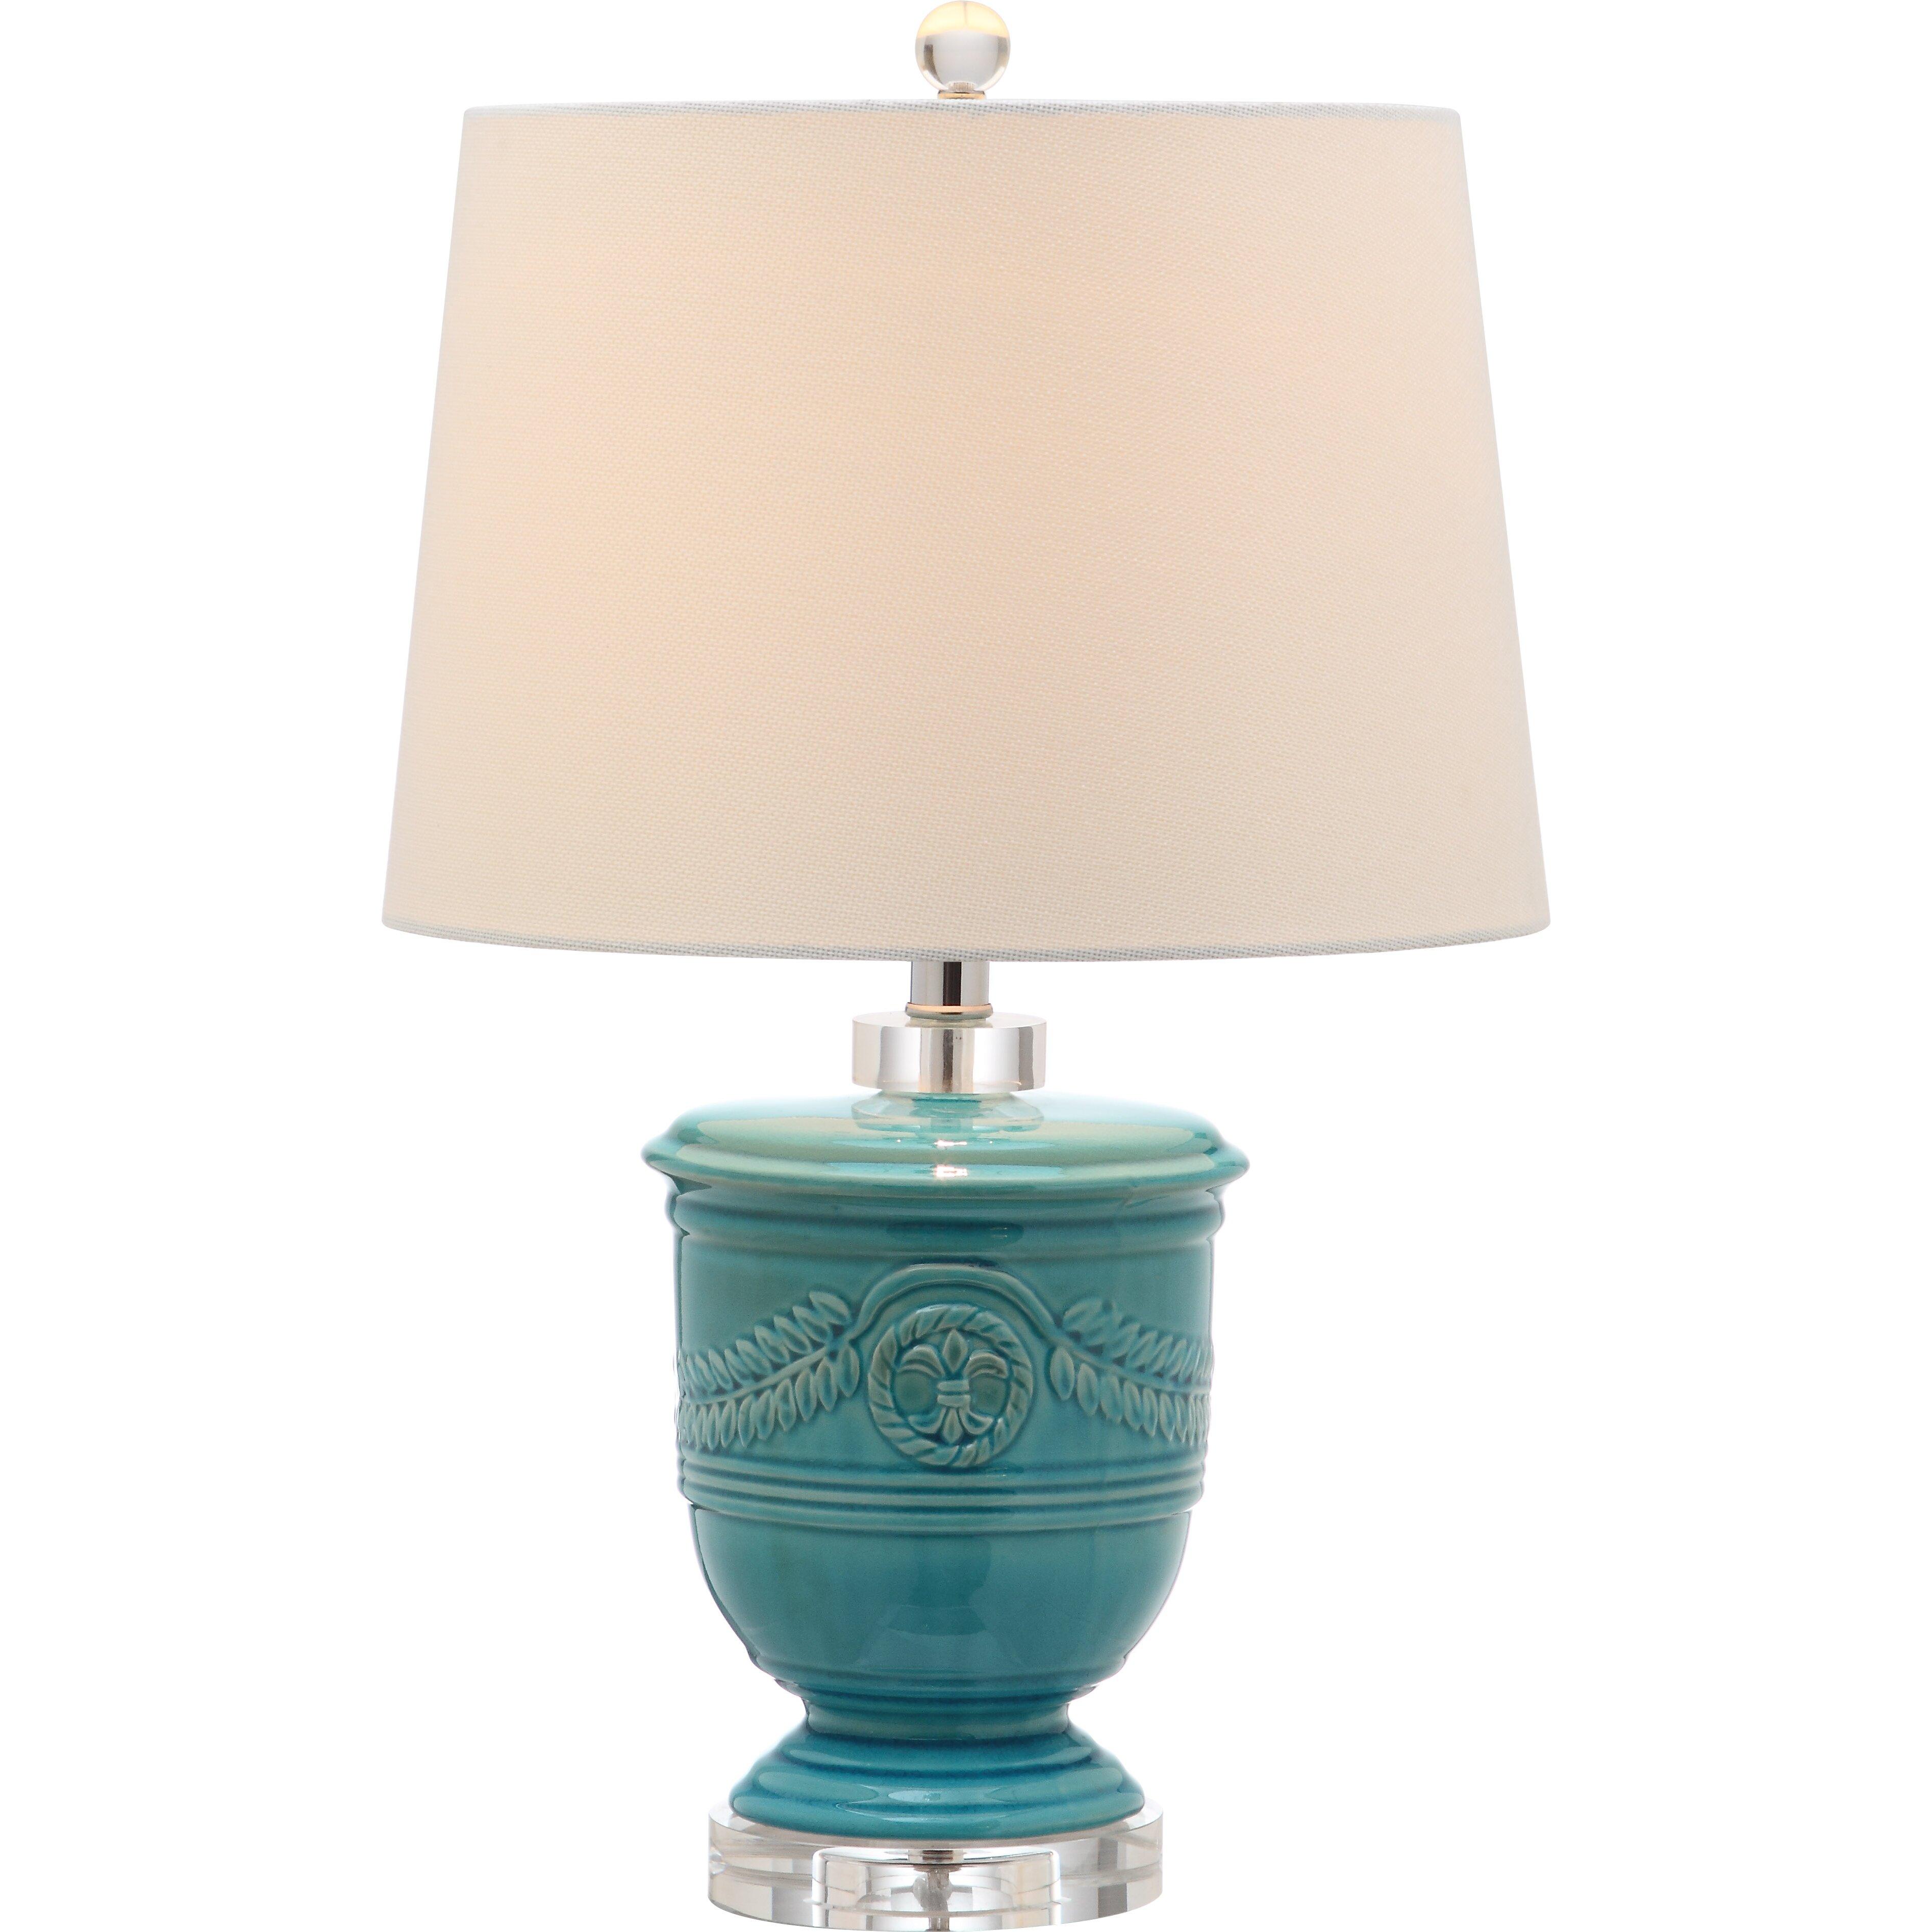 Safavieh shoal 235quot table lamps set of 2 reviews for Gazzetta 5 light table lamp